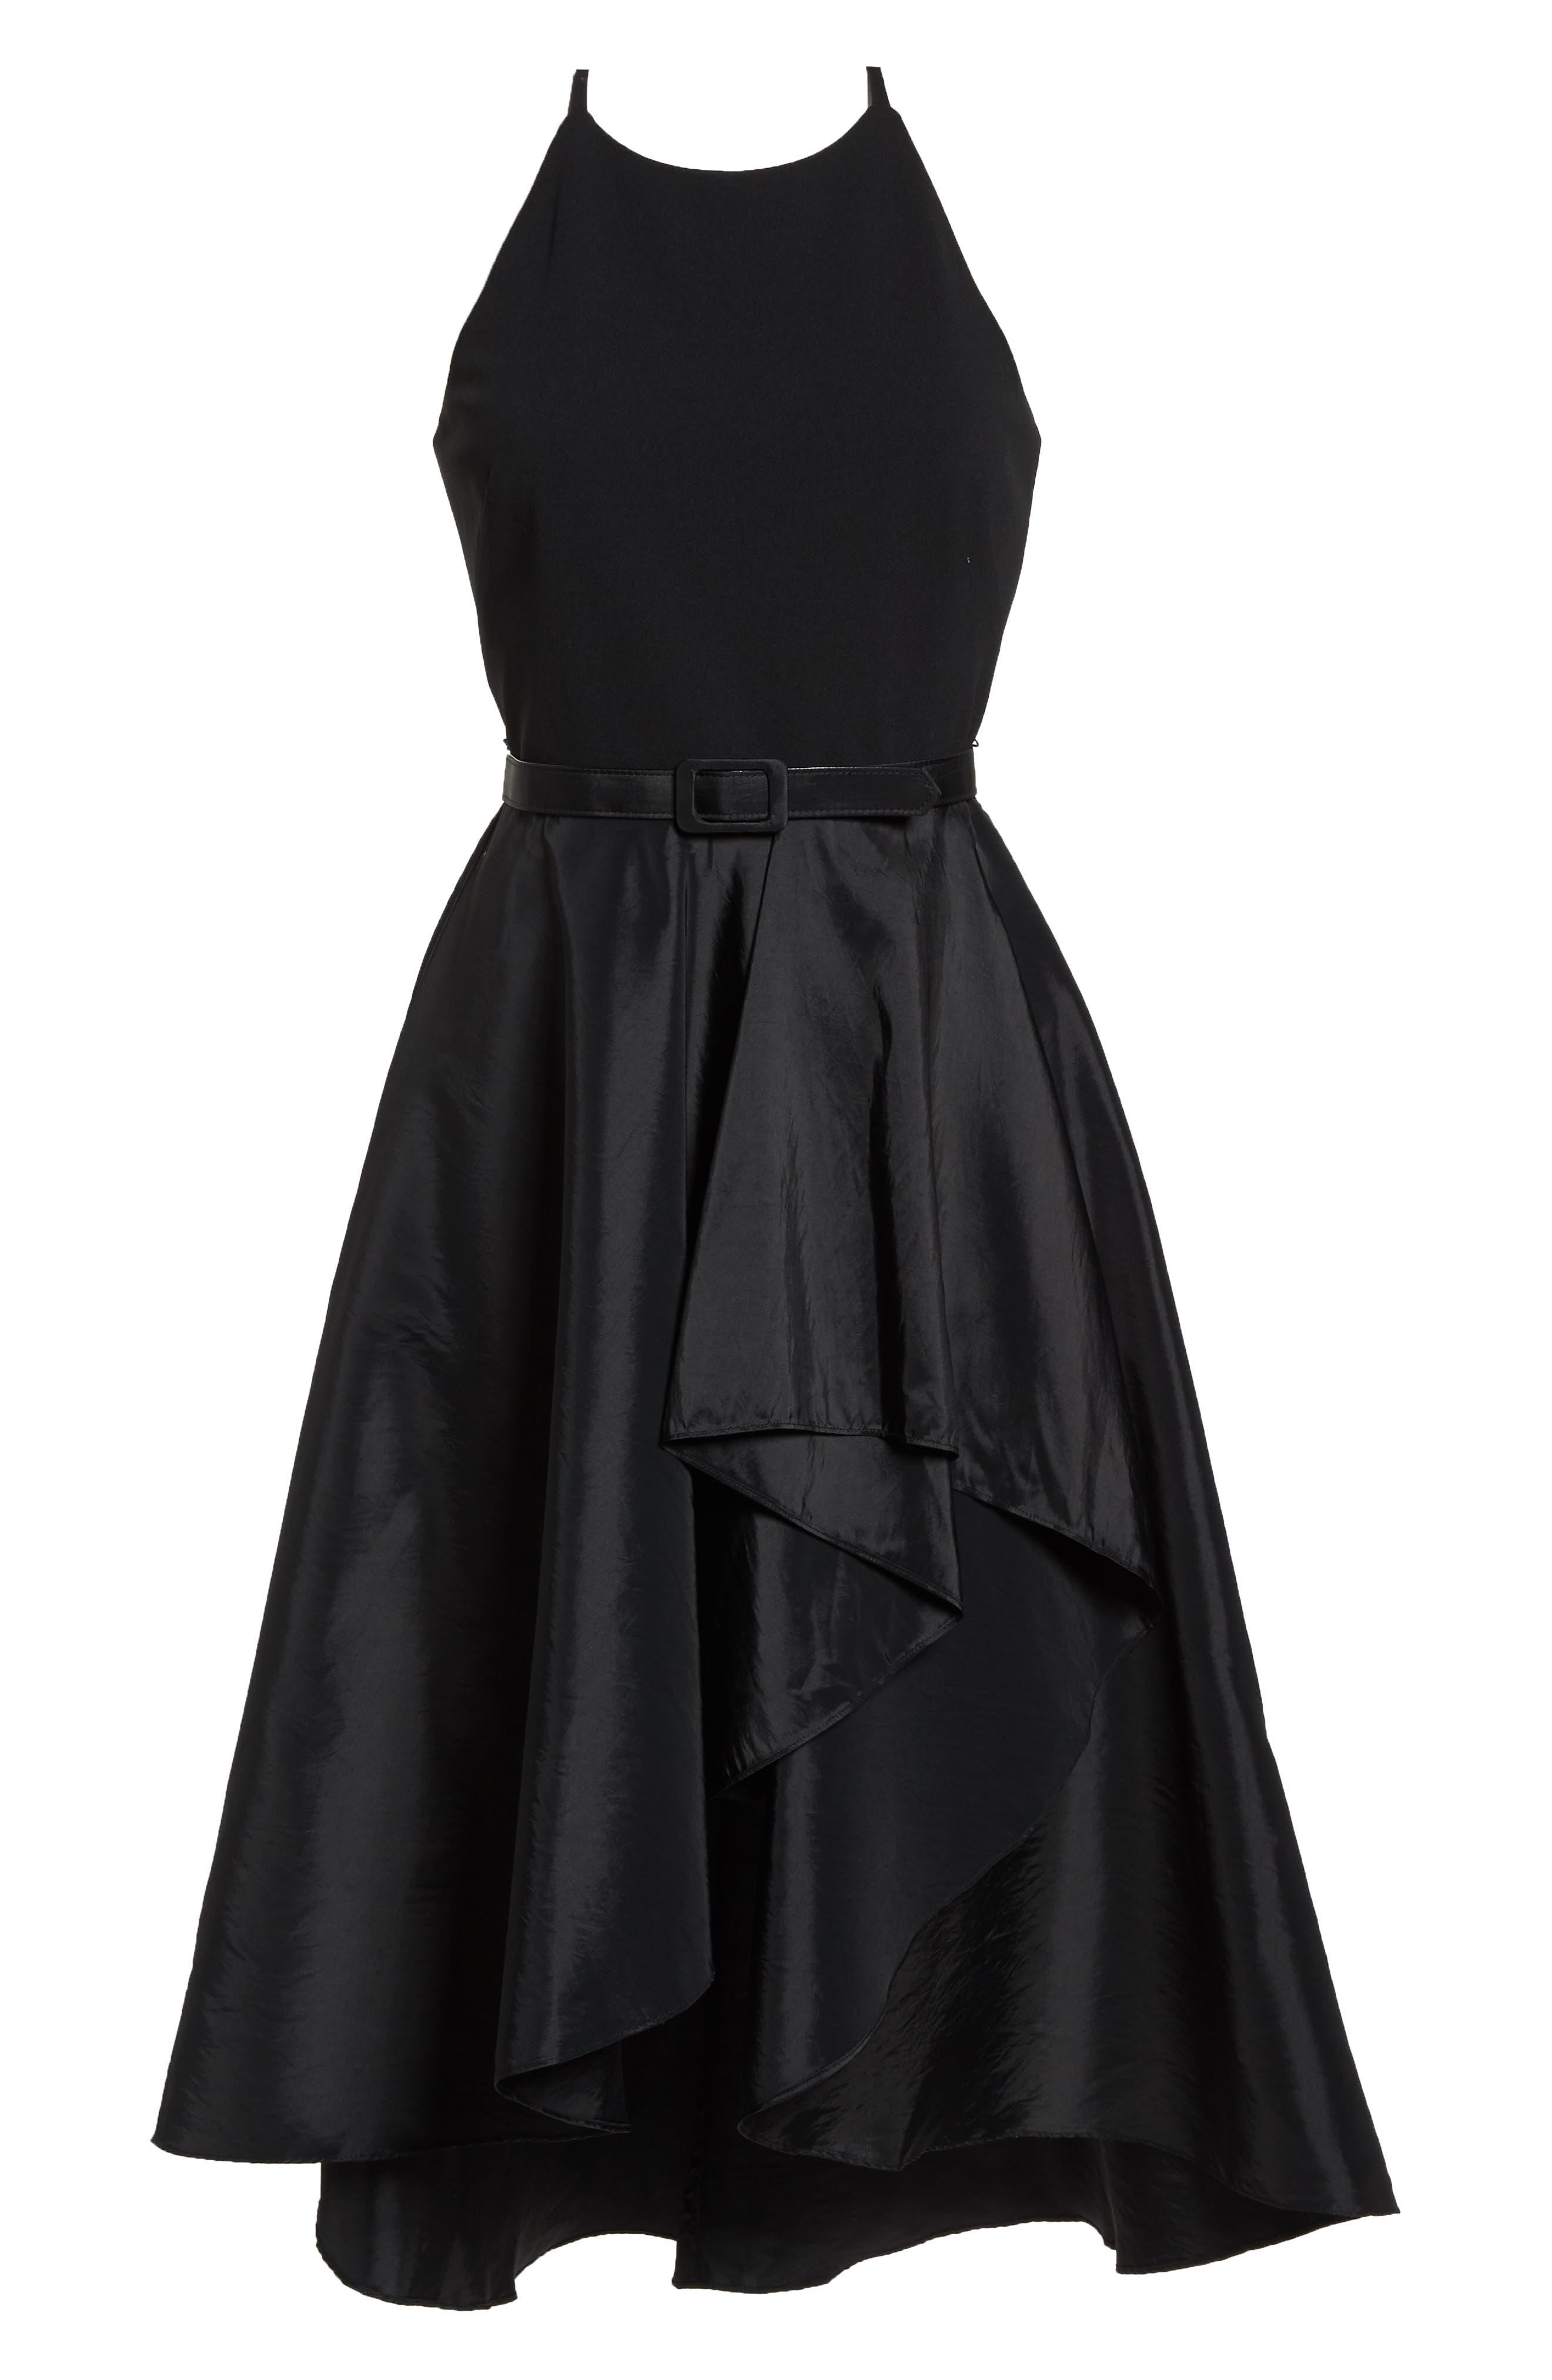 Asymmetrical Tea Length Dress,                             Alternate thumbnail 7, color,                             BLACK